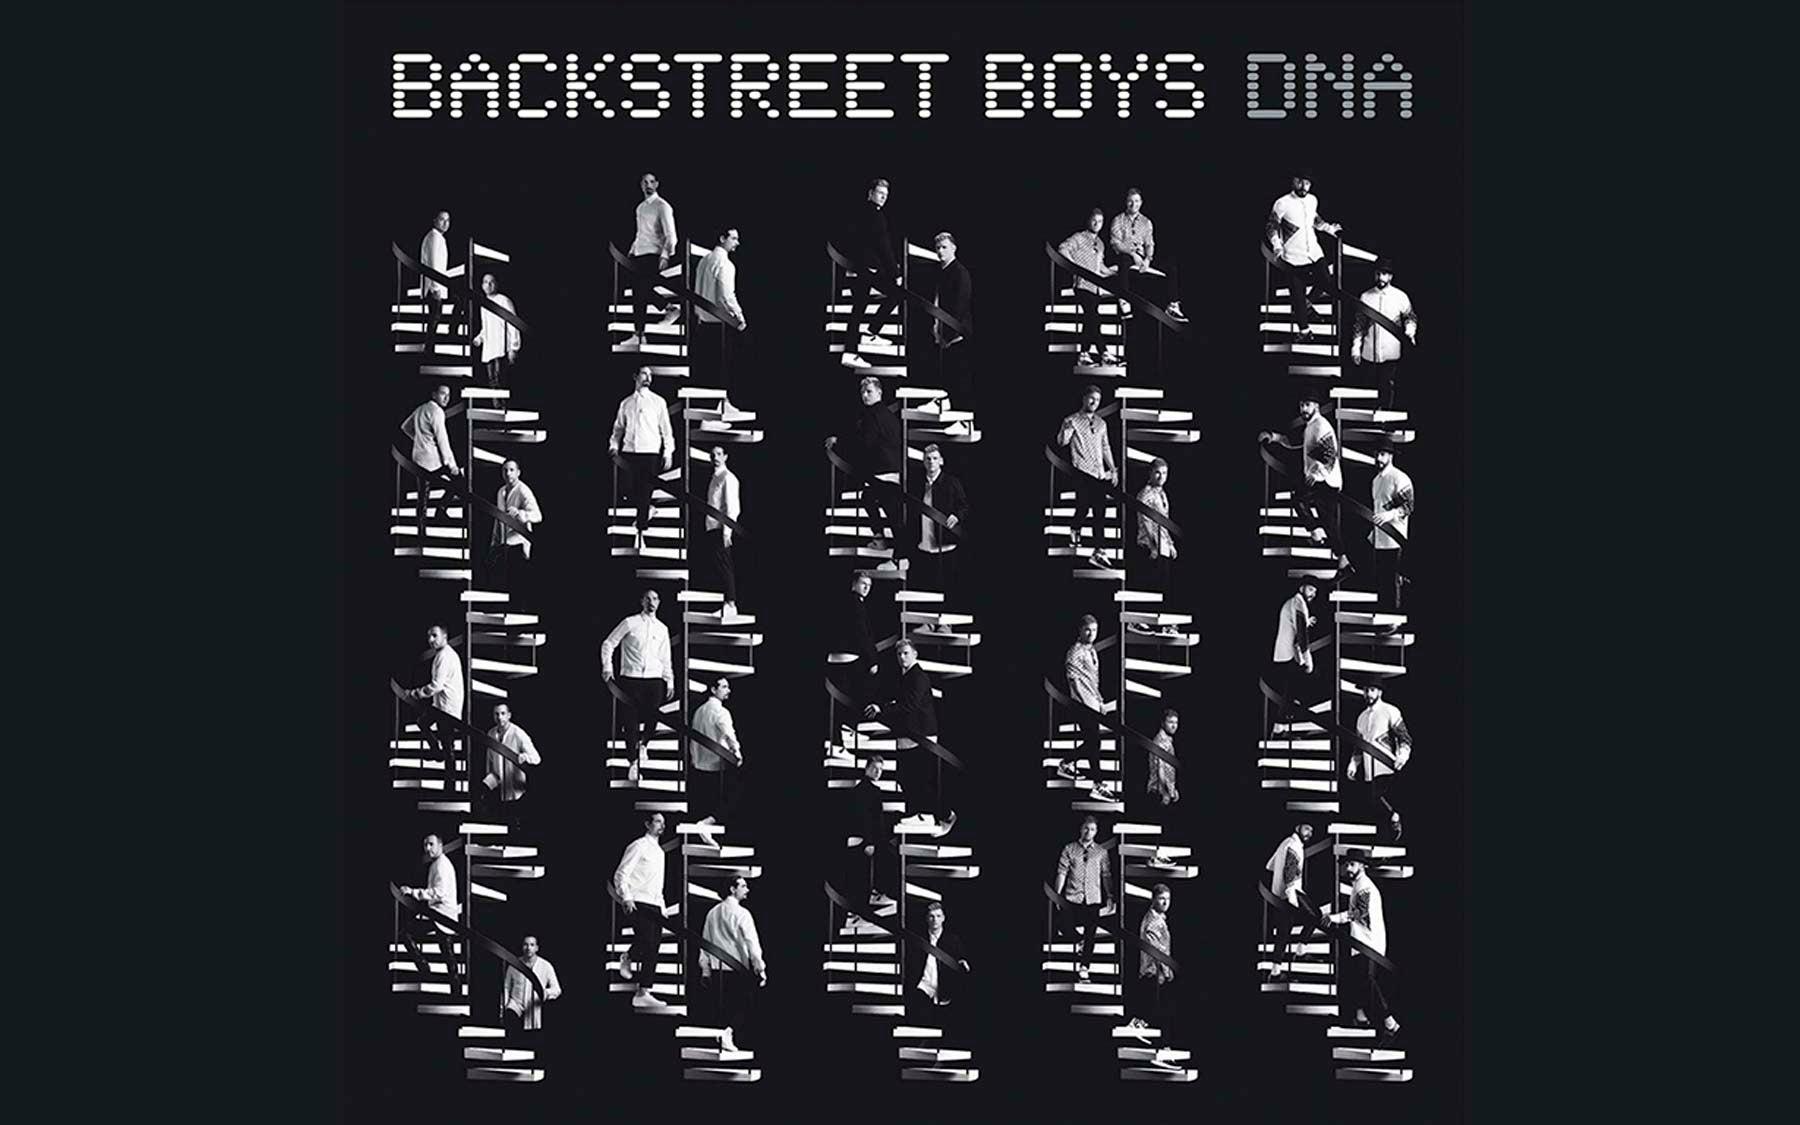 Backstreet Boys DNA album cover